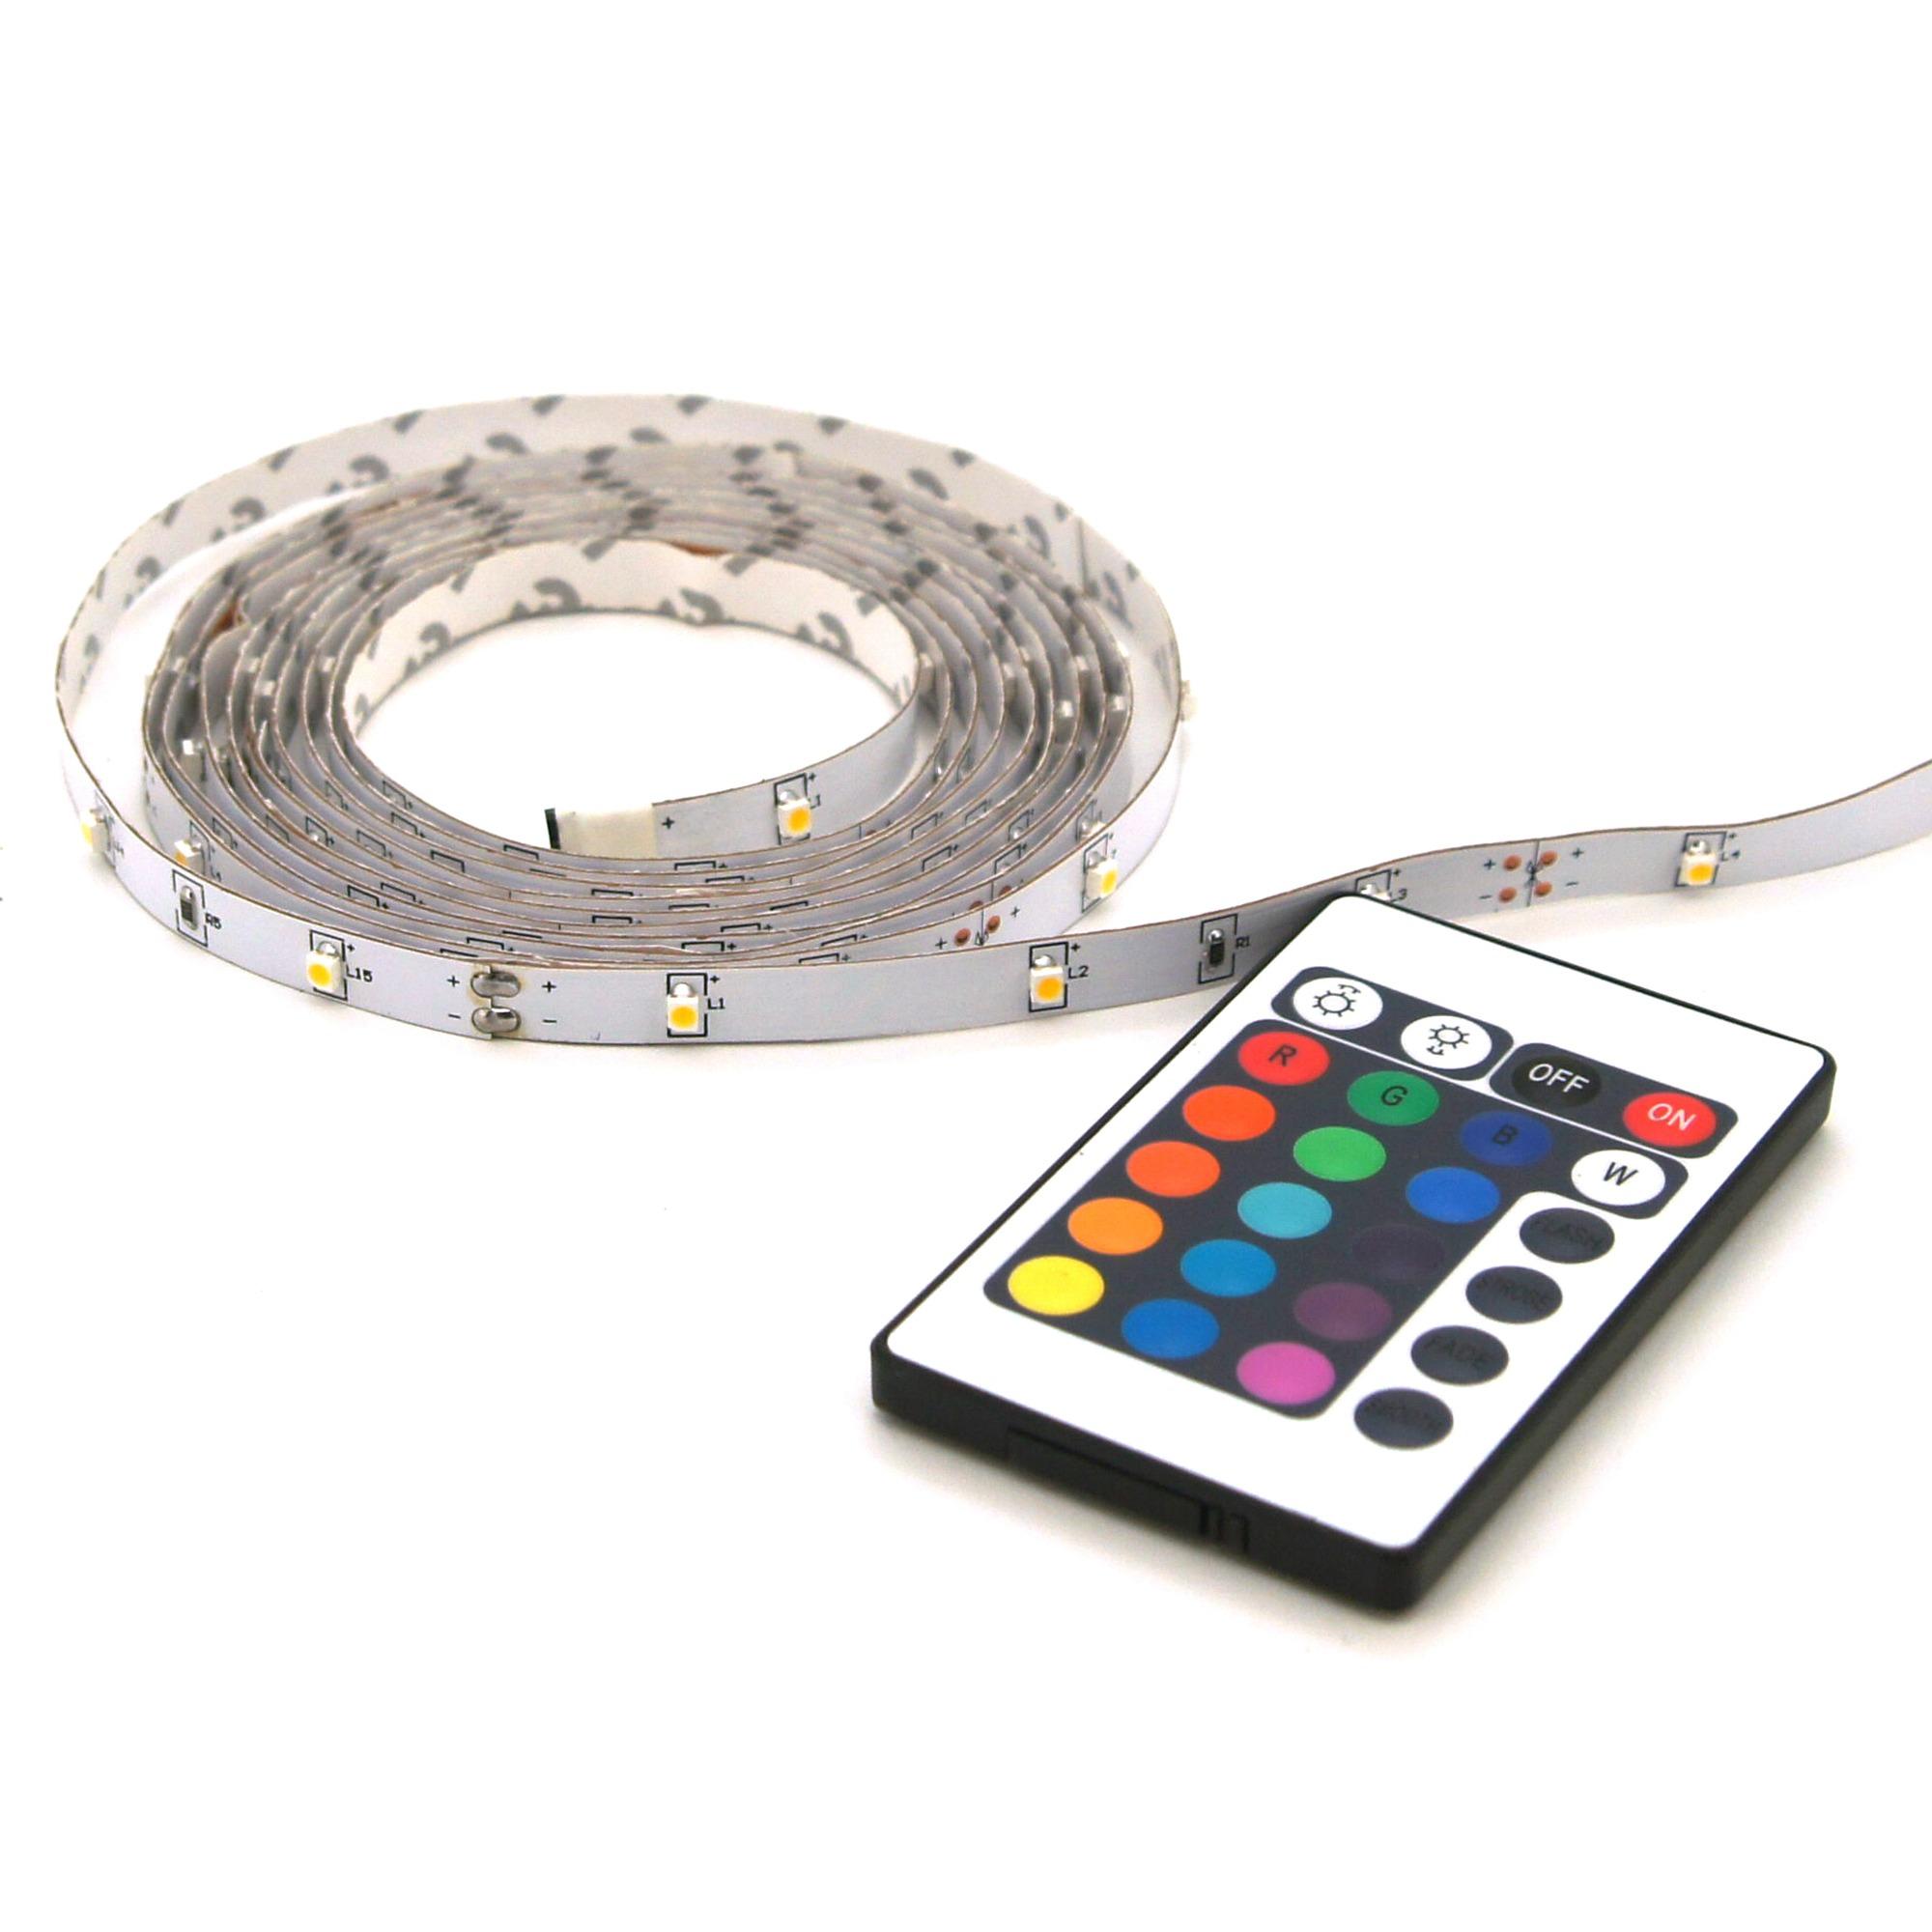 ruban led prolight avec t l commande ip20 rjb 2m rubans led luminaires clairage. Black Bedroom Furniture Sets. Home Design Ideas